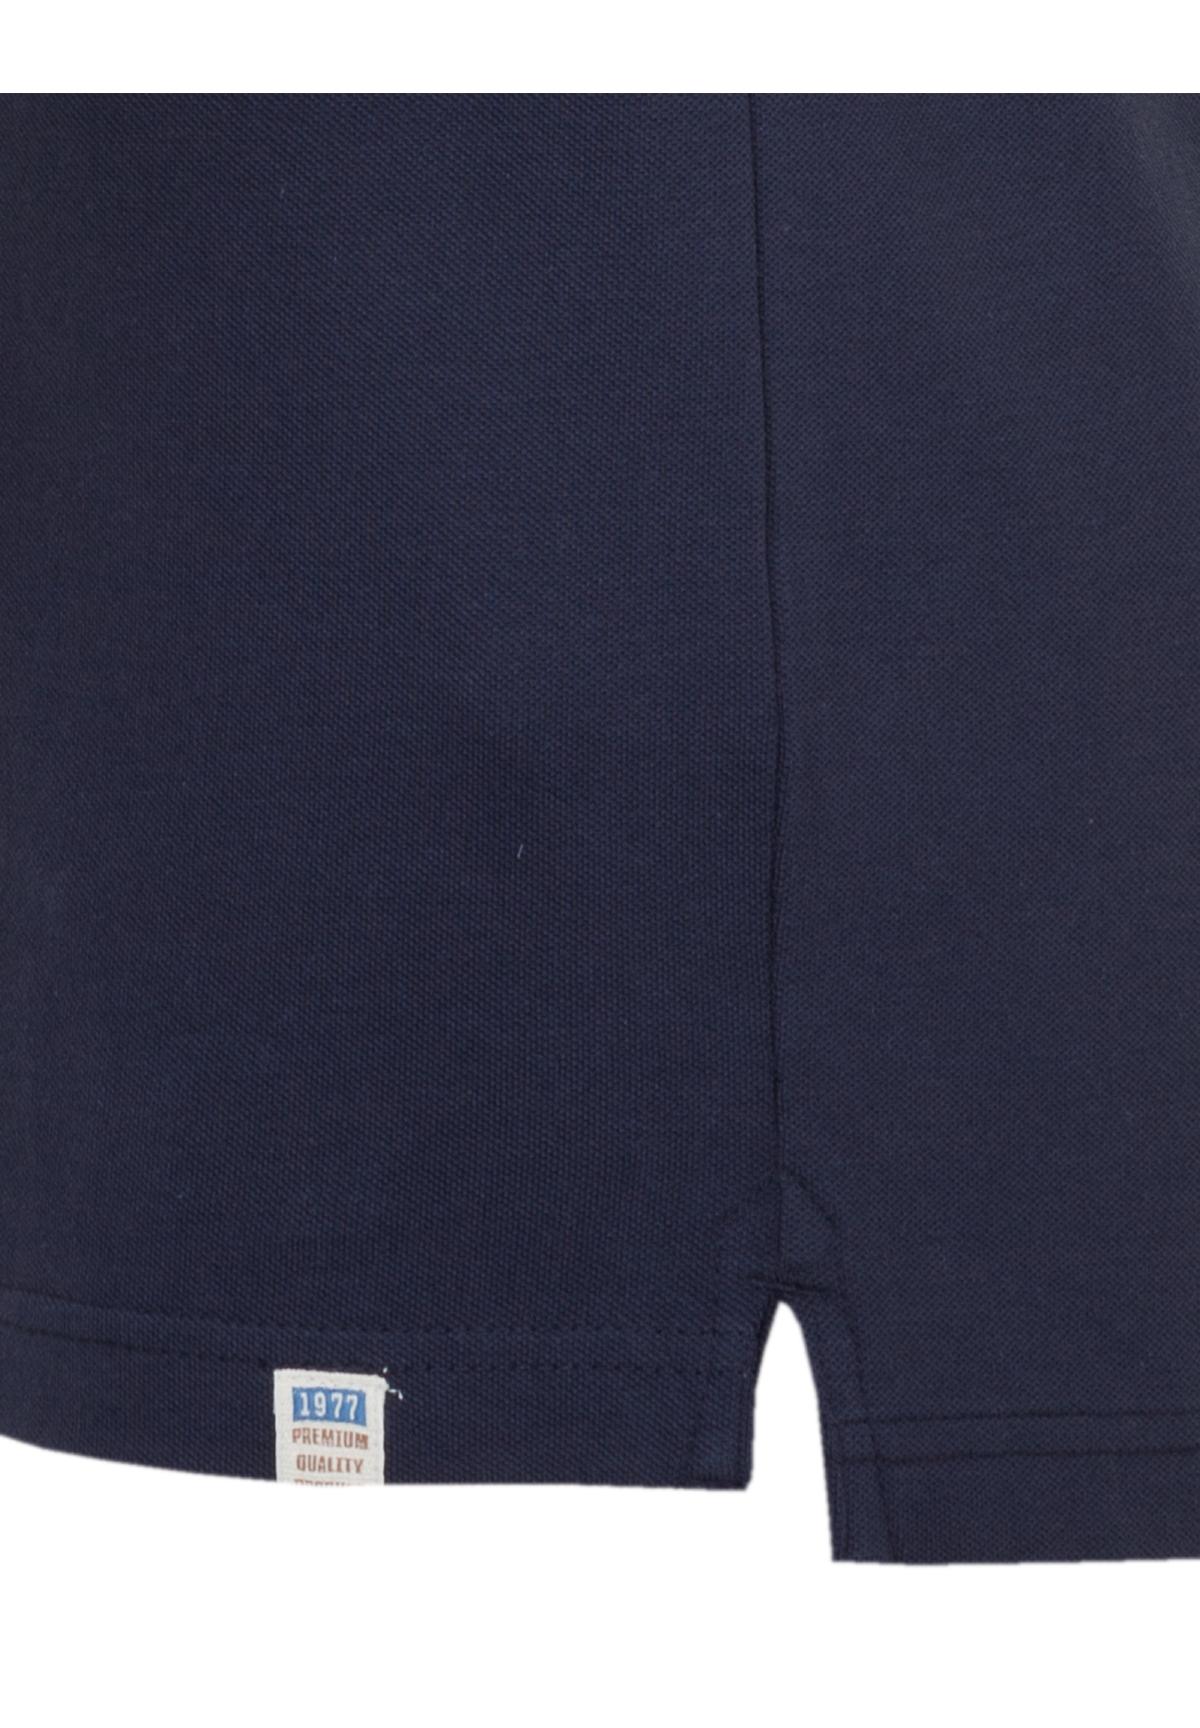 Camel-Active-Herren-Shirt-Poloshirt-Pique-Regular-Fit-NEU Indexbild 24